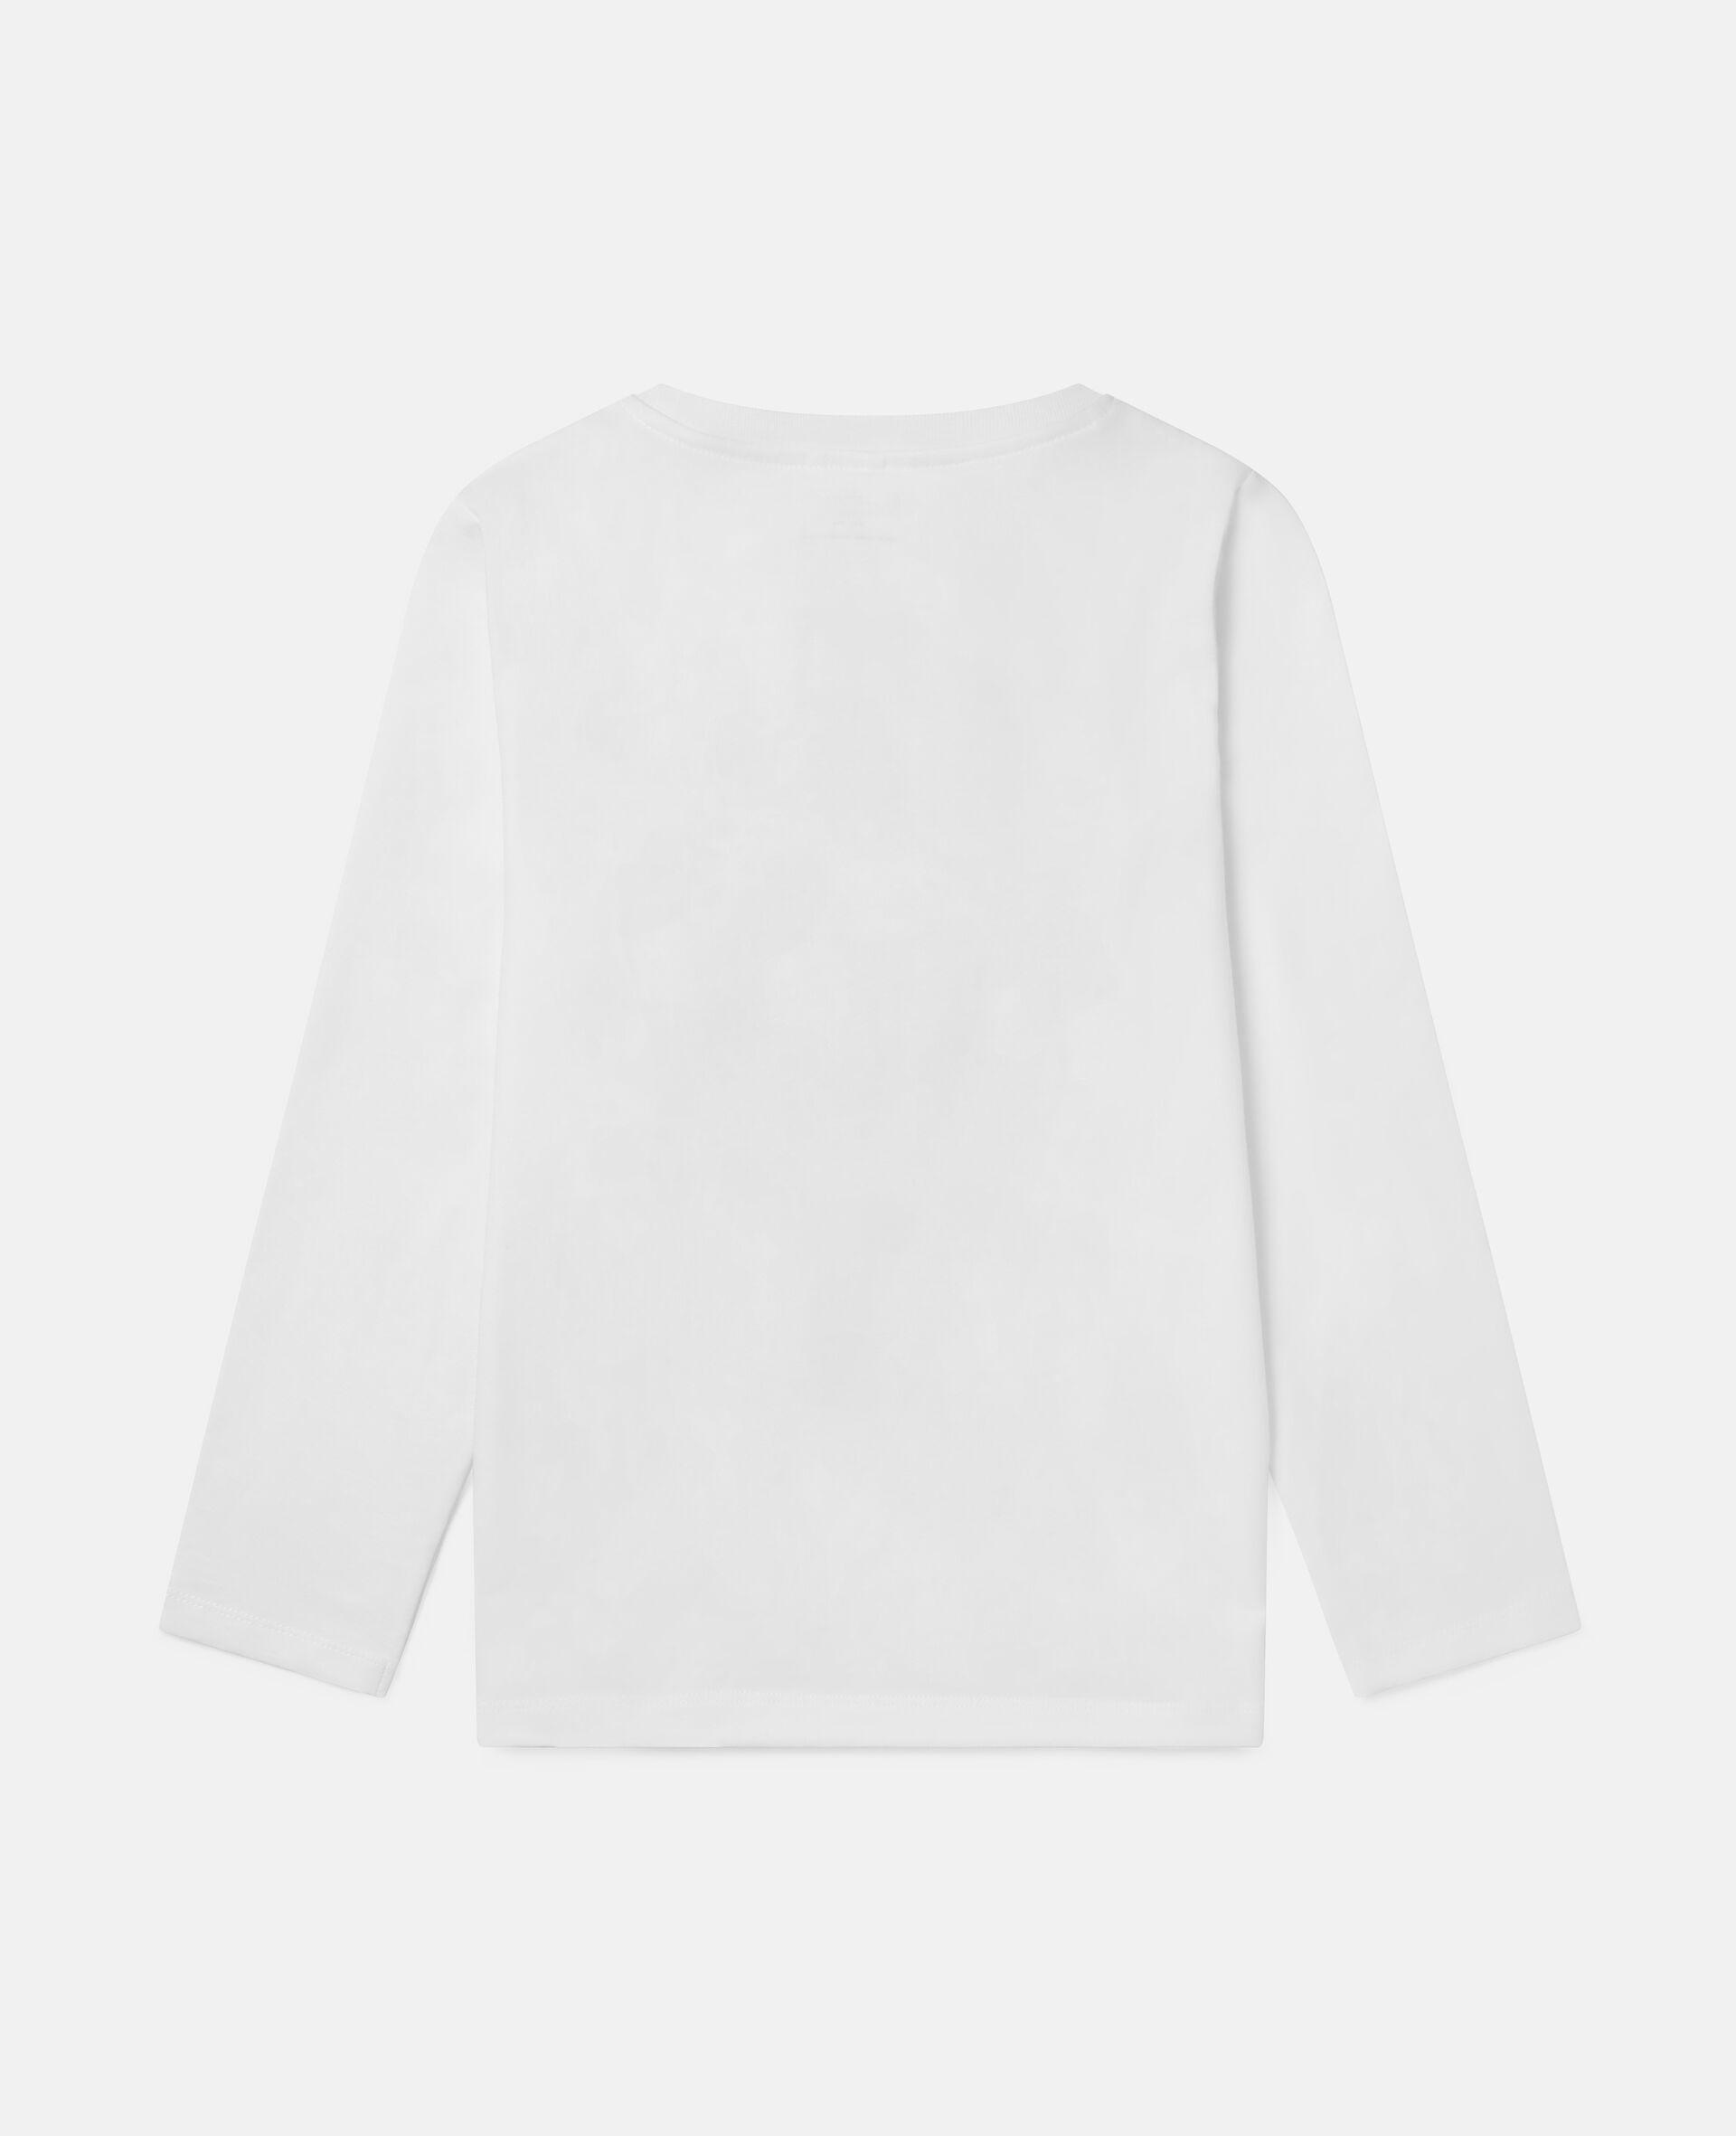 Top aus Baumwolle mit Happiest-Print-Weiß-large image number 3